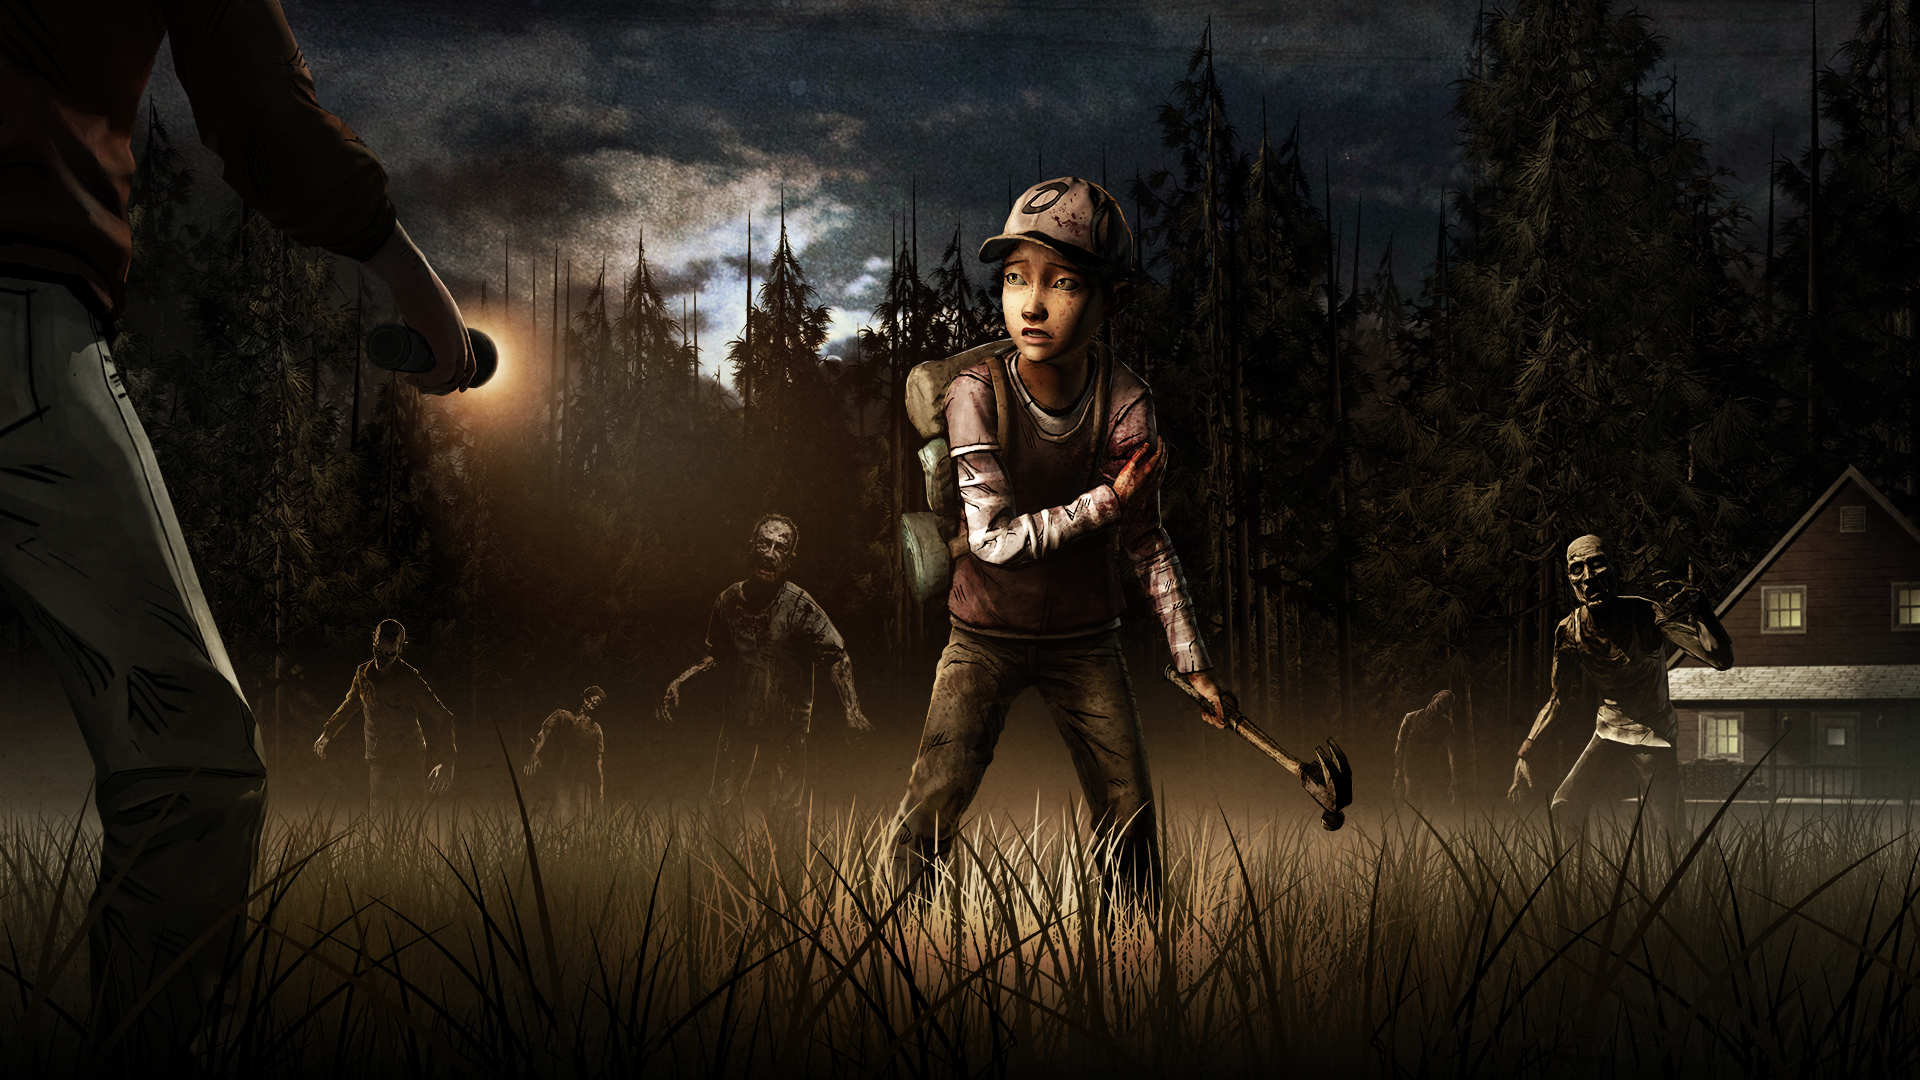 E3 2016: Telltale's The Walking Dead: Season 3 shown in first trailer plus first screenshots for Batman emerge